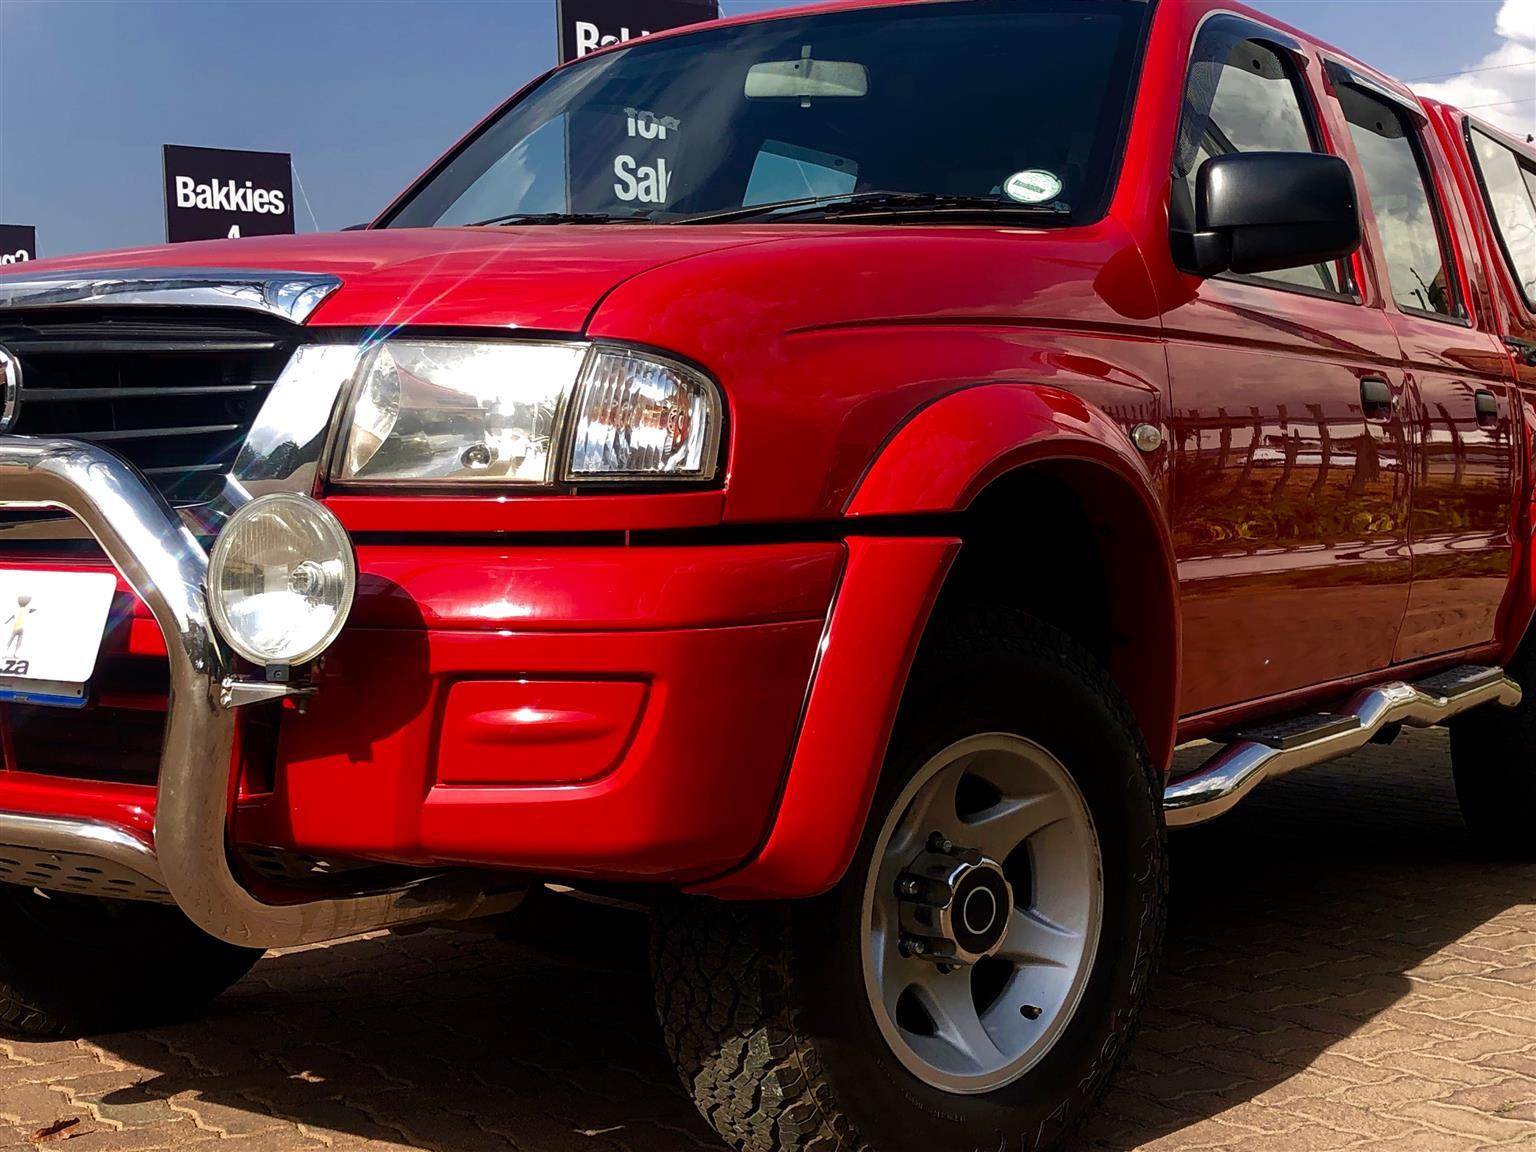 2007 Mazda Drifter B2500TD hi ride double cab SLE